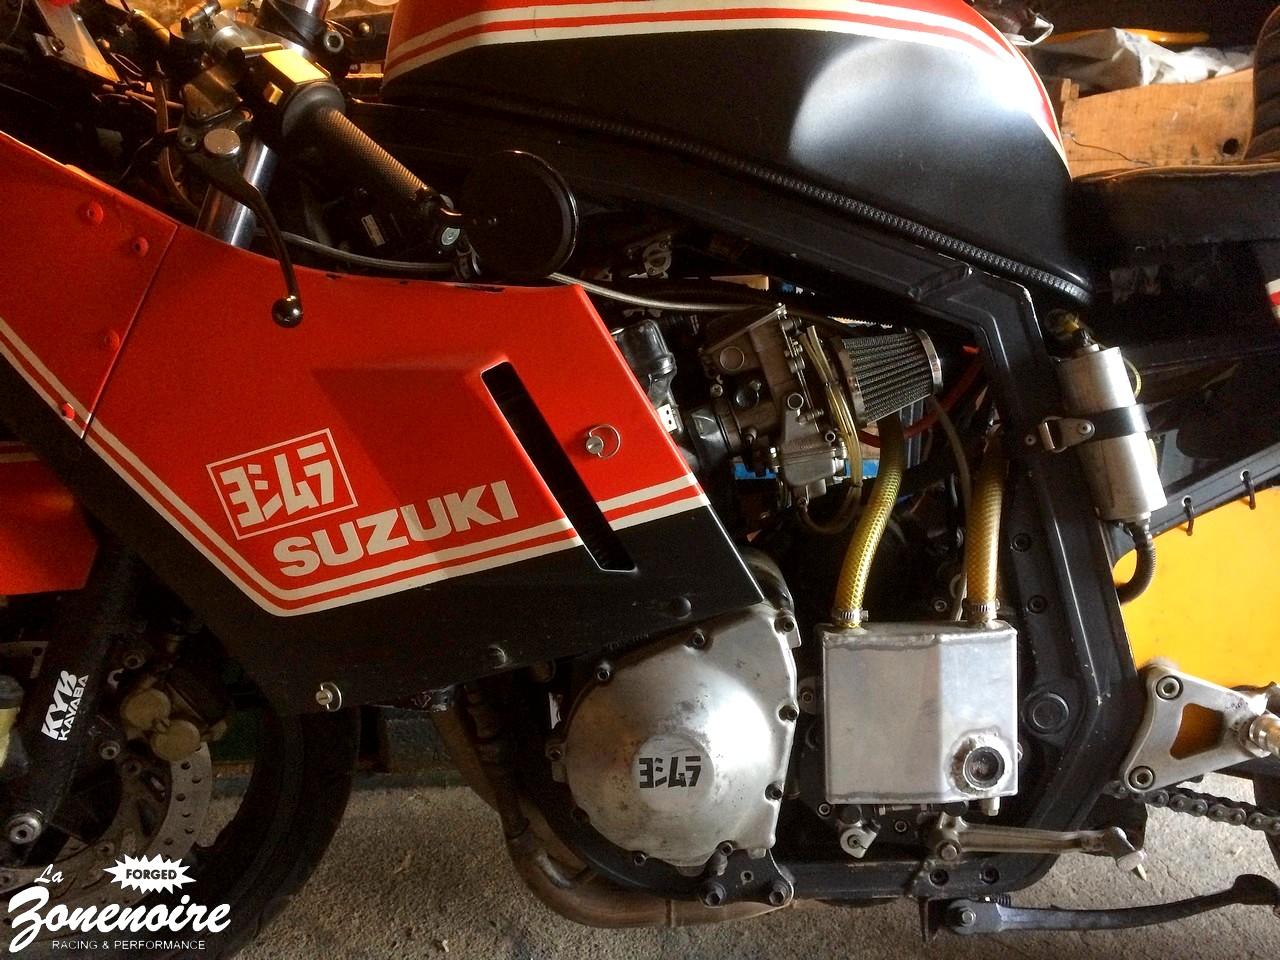 Suzuki GSX-R Slabside 750 (85-87) et 1100 (86-88) Sujet N°2 - Page 6 14.%2B750%2Byoshimu%2527rats%2B%2528LaZoneNoire.2019%2529